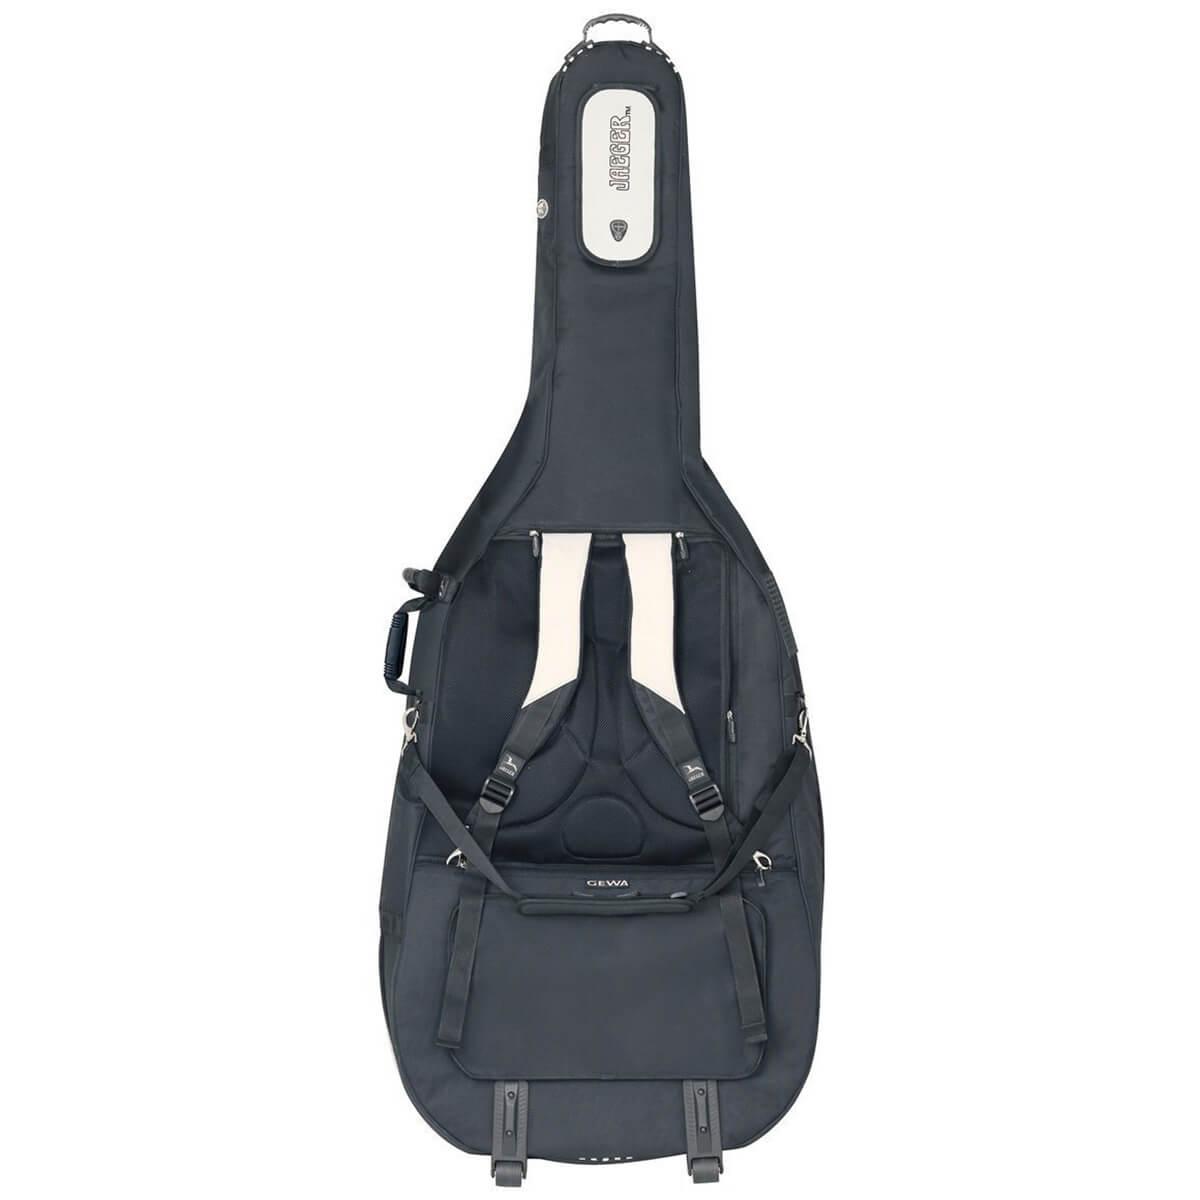 Jaeger Rolly Double Bass Gig Bag Rear